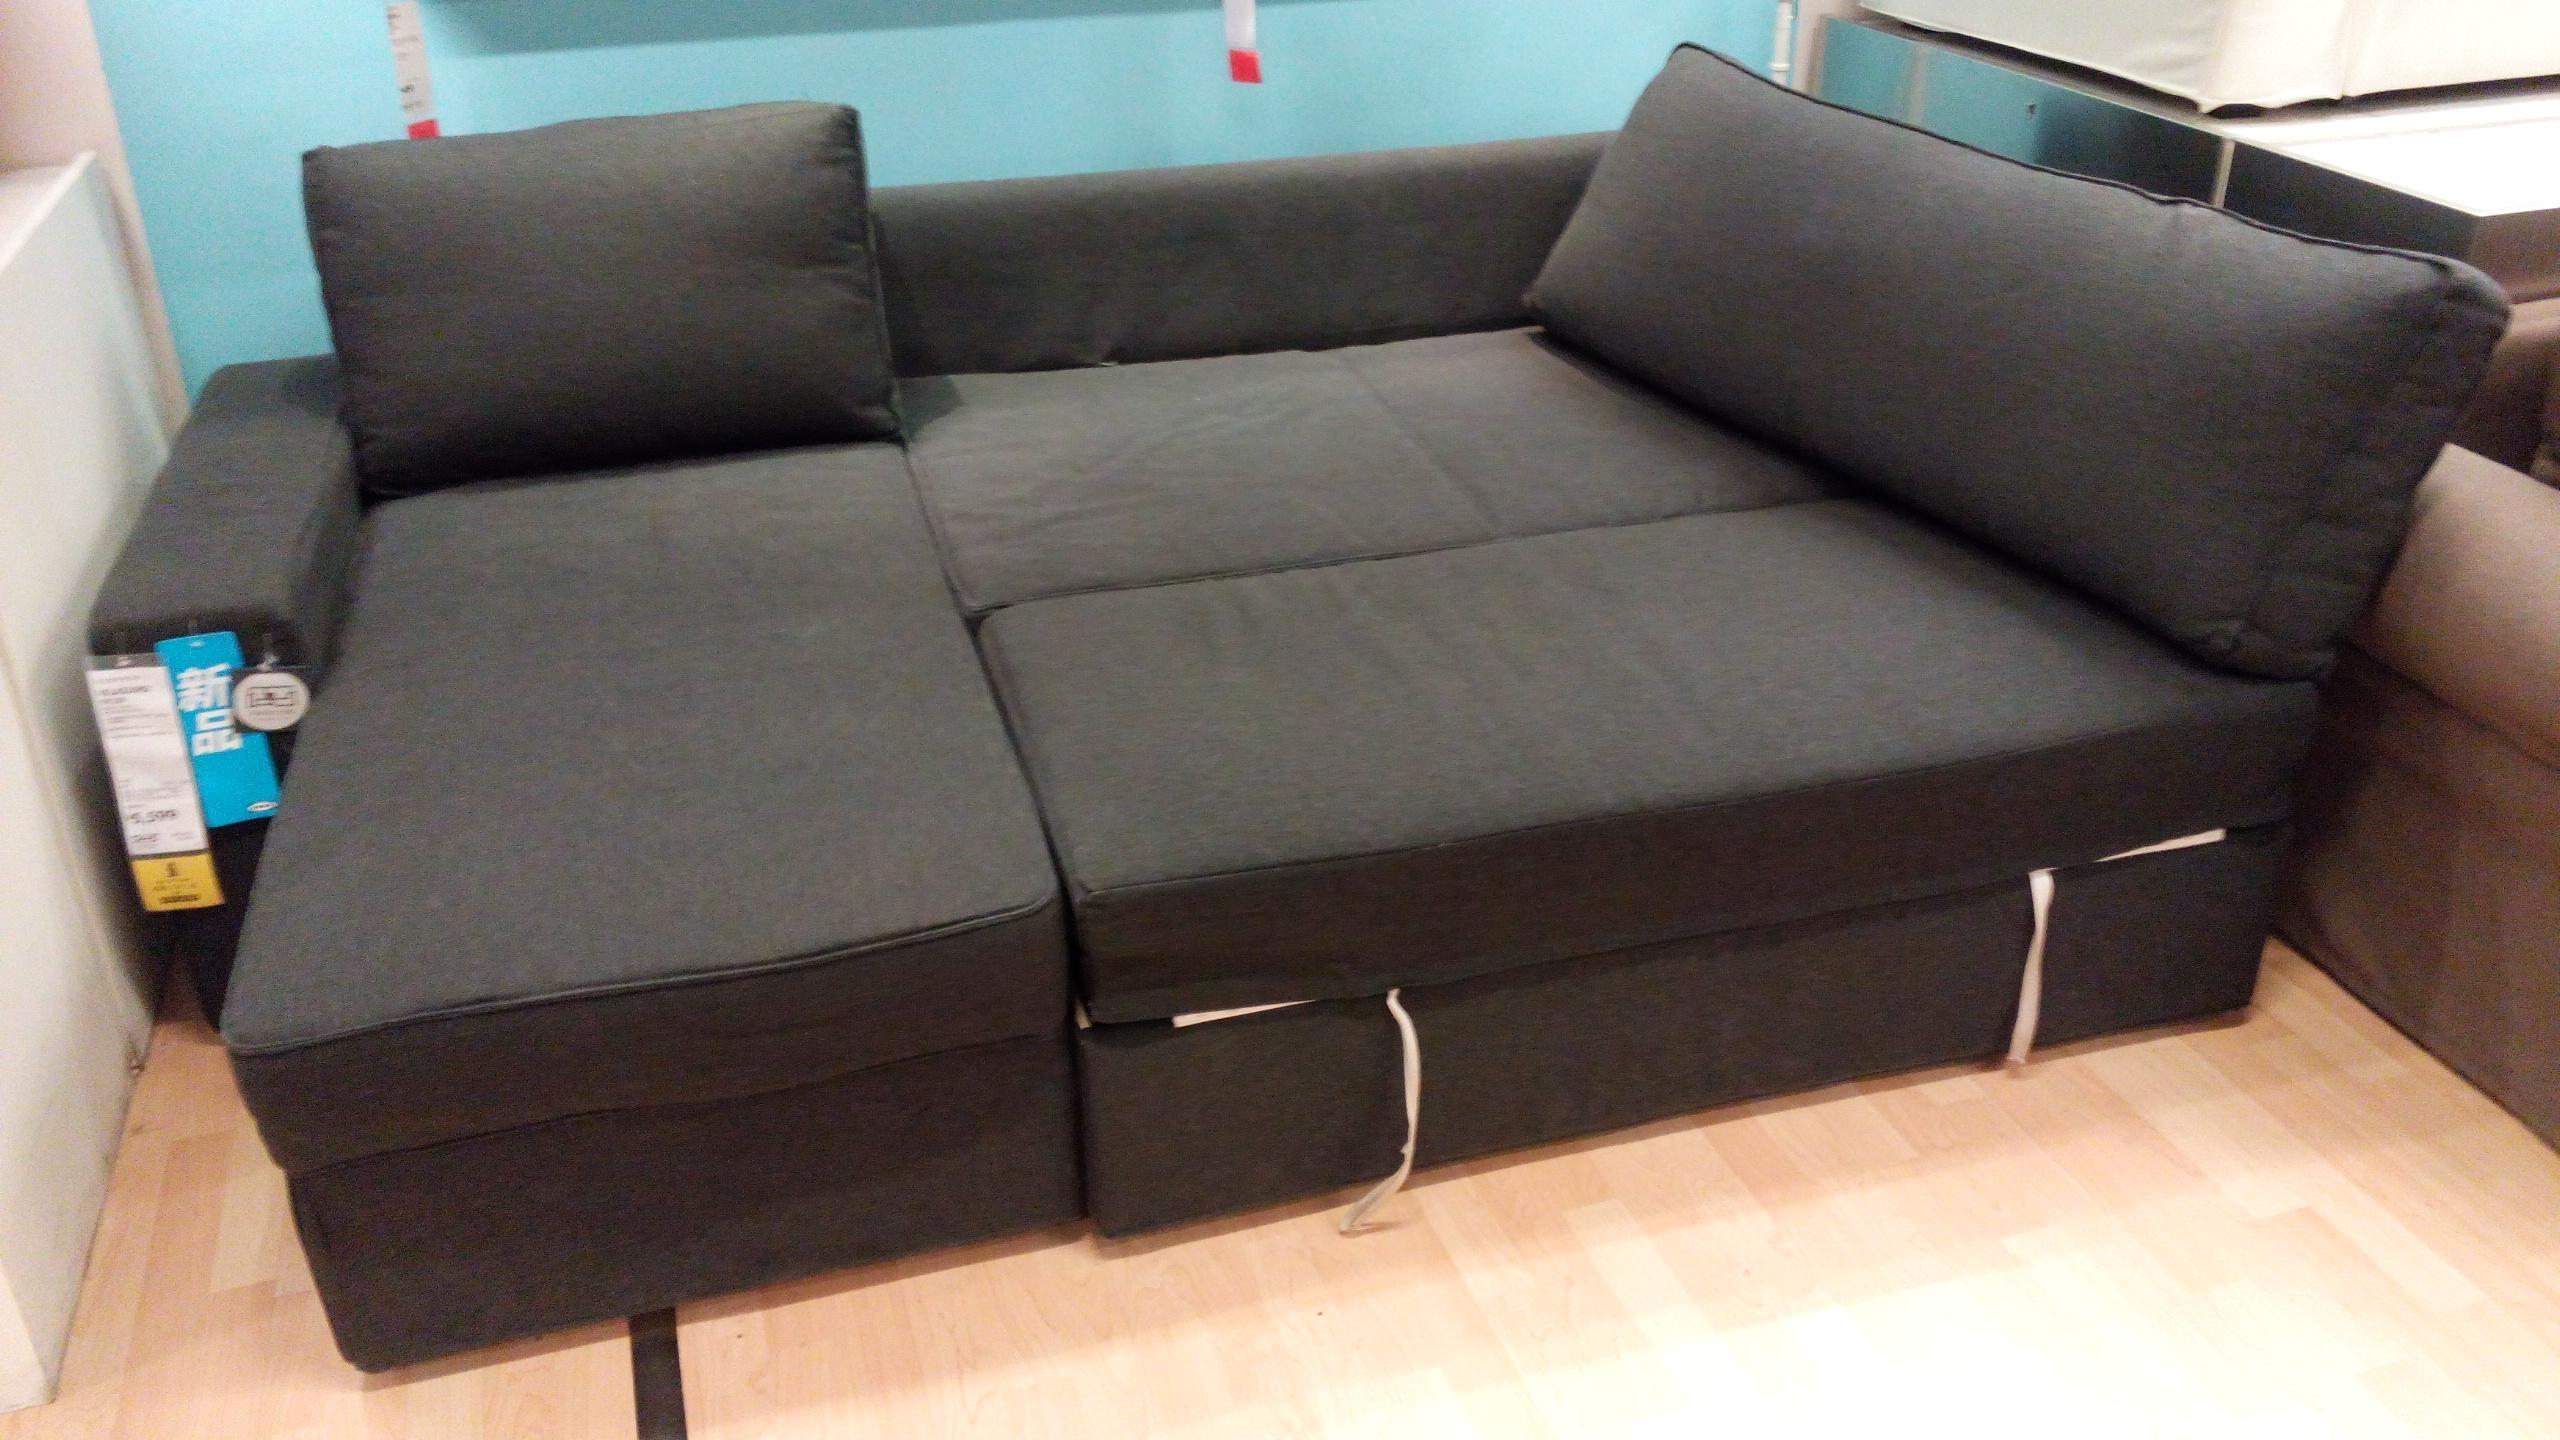 White Sleeper Sofa Ikea | Tehranmix Decoration Regarding Ikea Sectional Sleeper Sofa (Image 20 of 20)